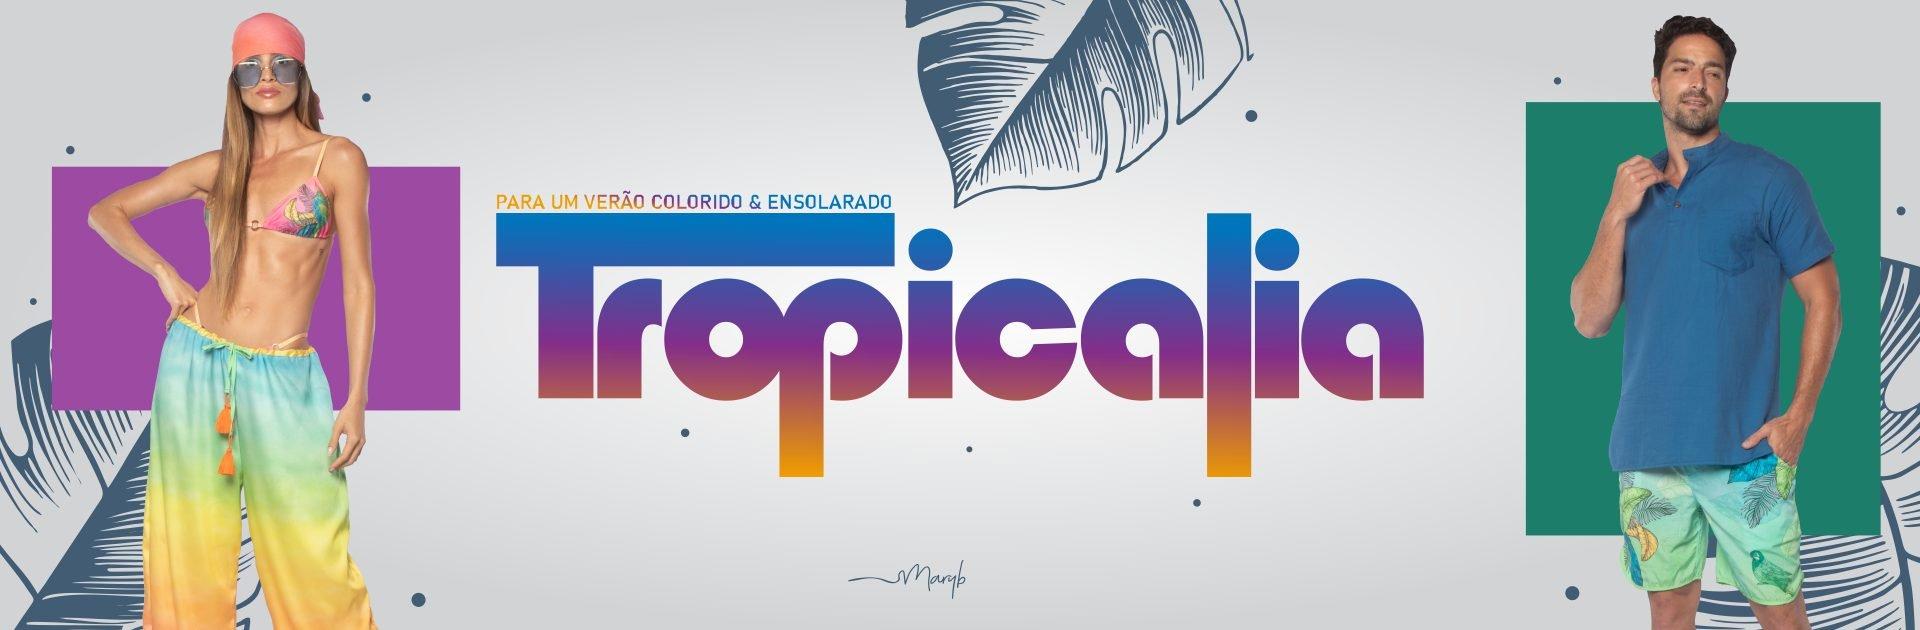 tropicalia banner 1